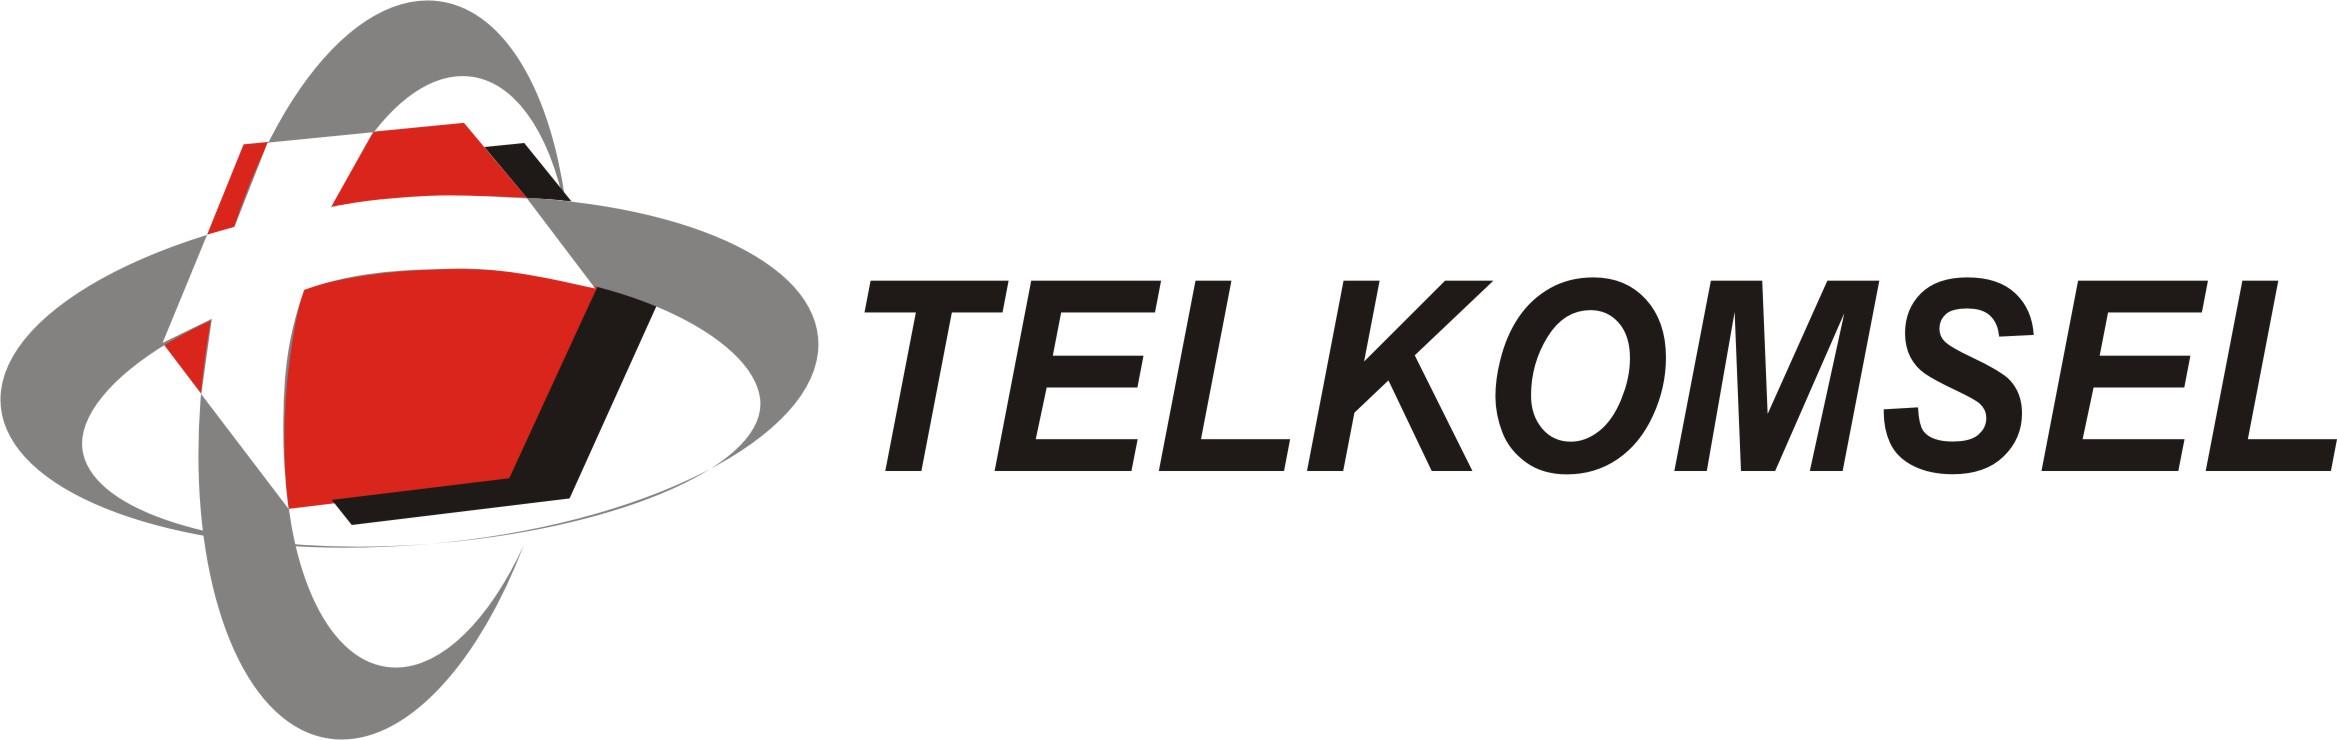 Trick Internet Telkomsel Maret 2012